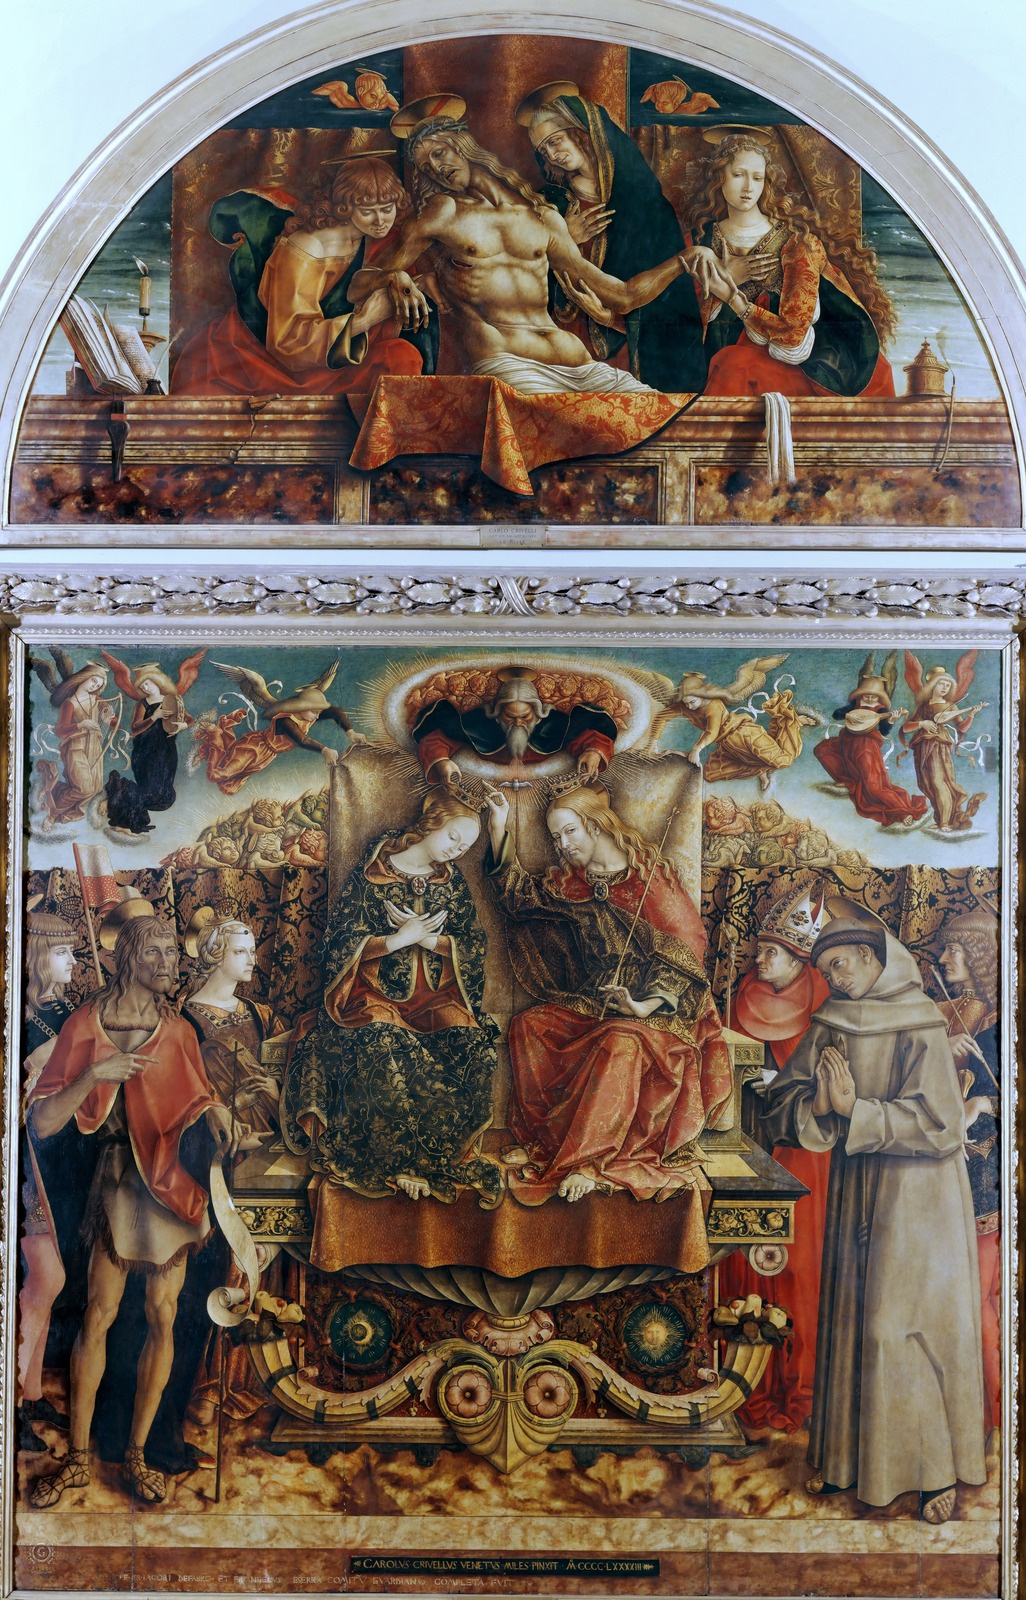 Carlo Crivelli. Coronation of the Virgin Mary